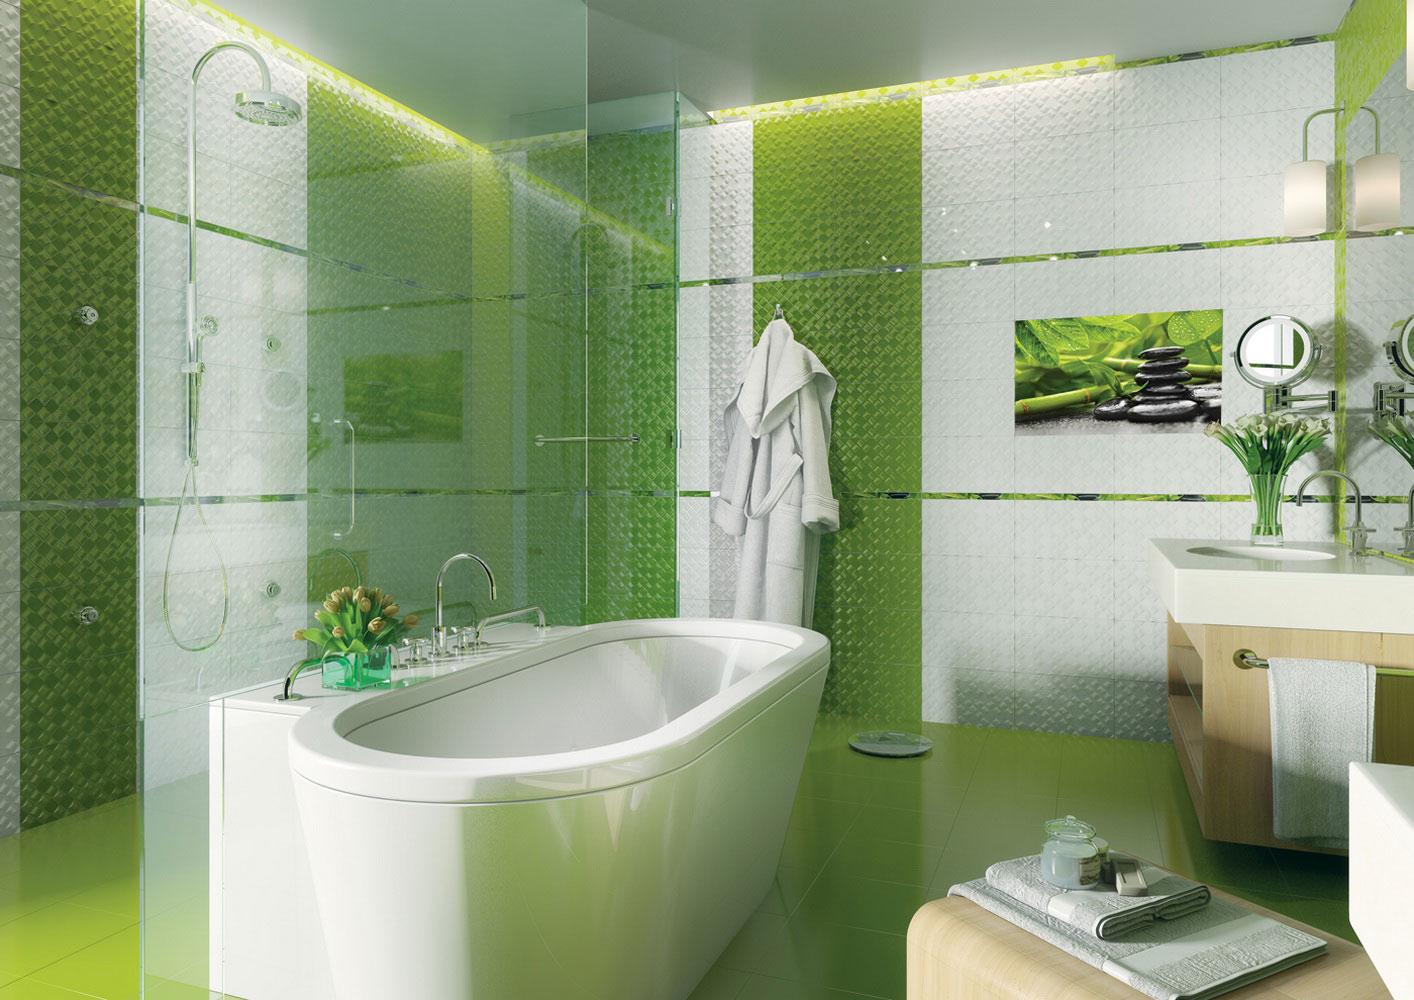 Ванна с зеленым цветом